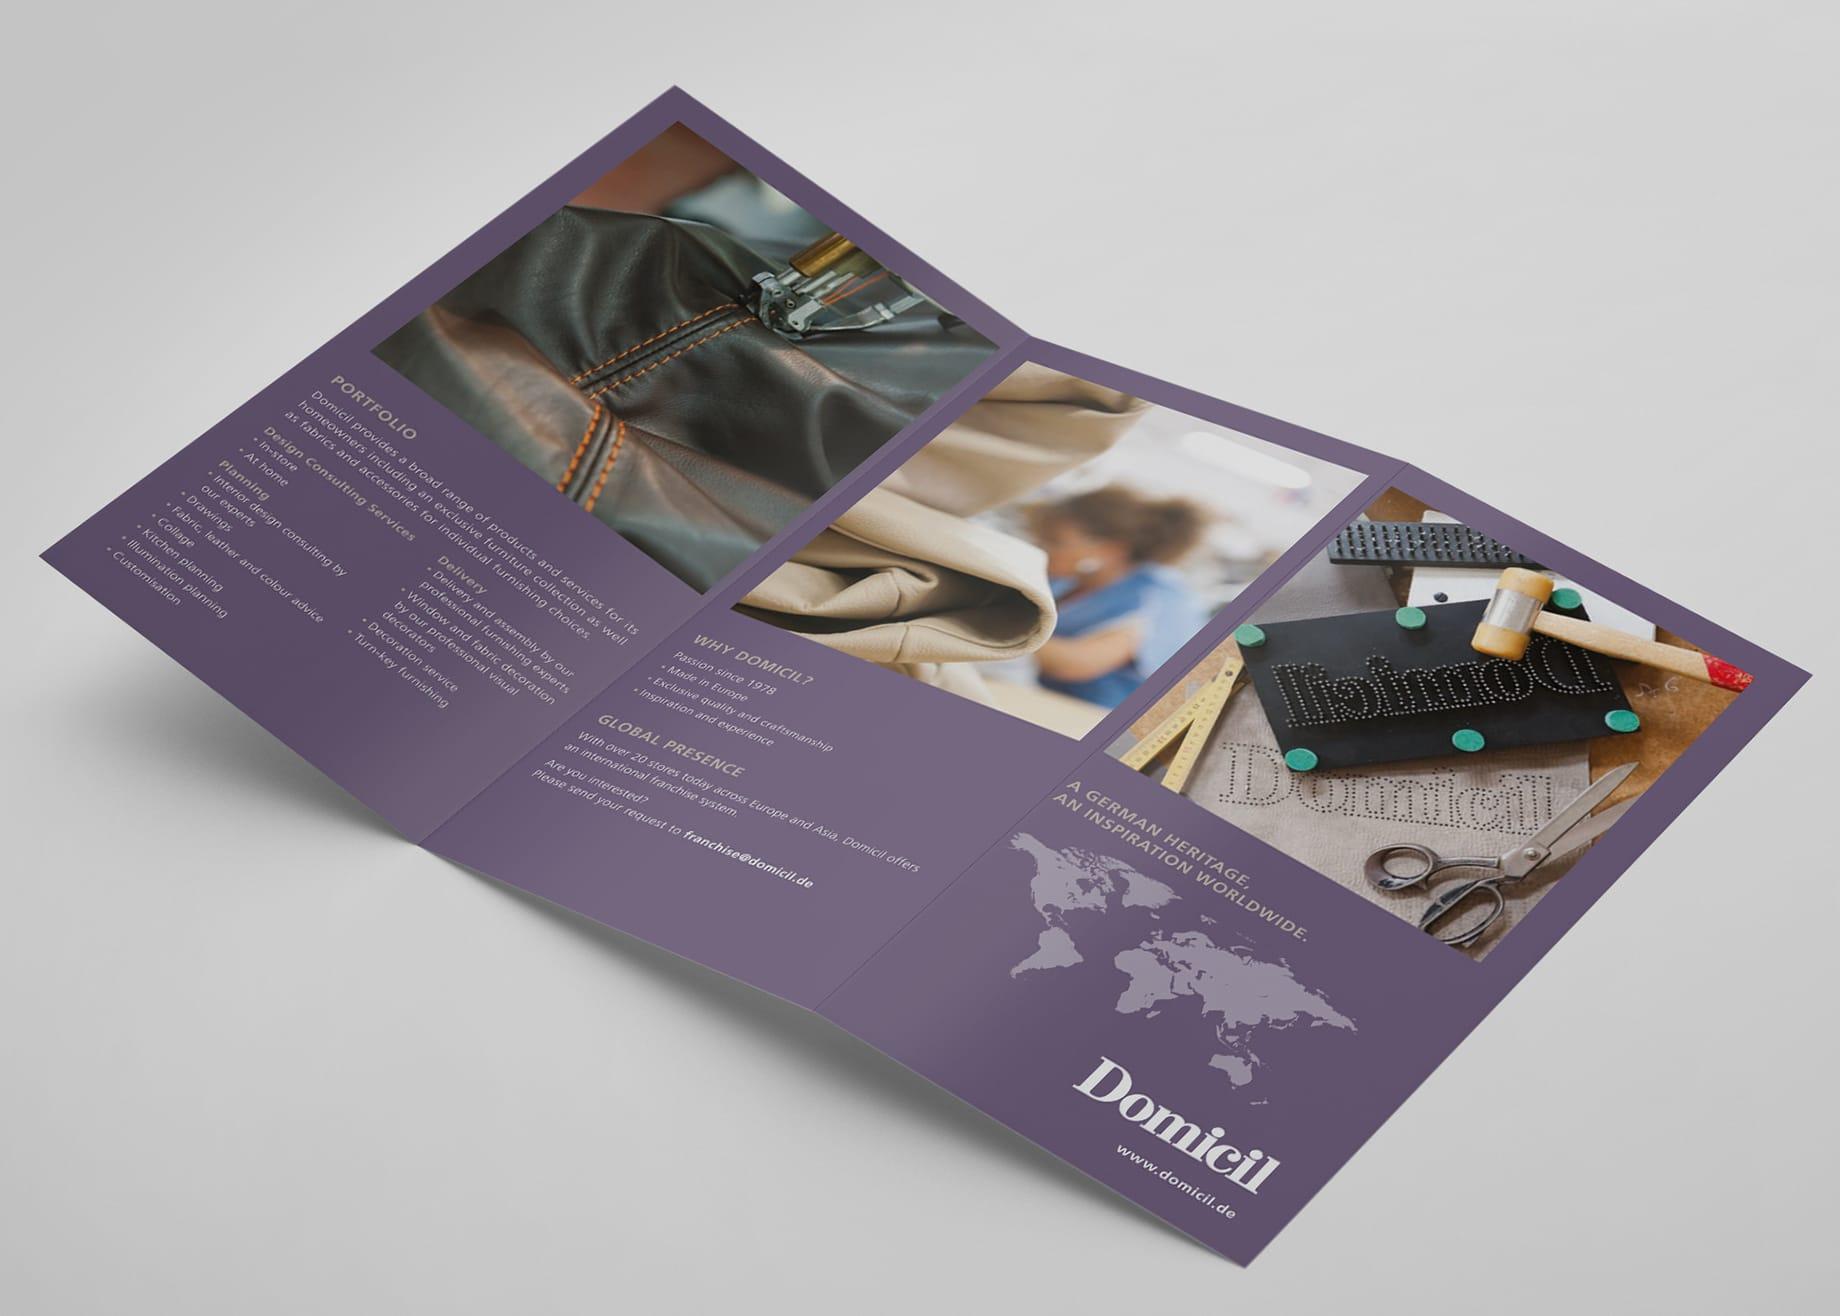 Flyer Domicil